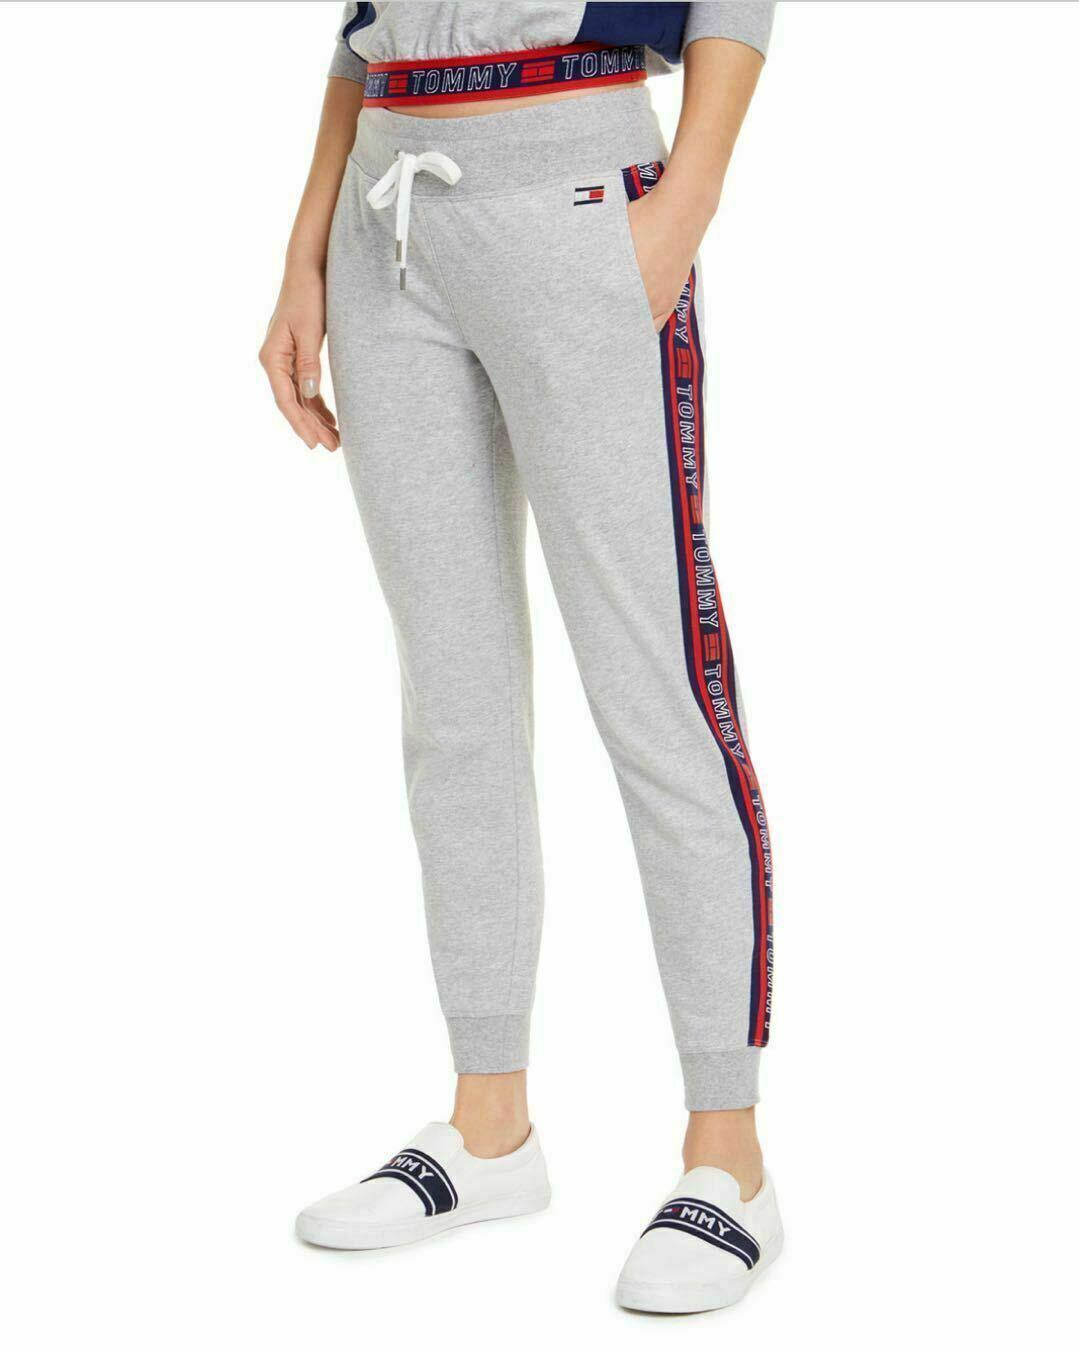 Tommy Hilfiger Sport Logo Jogger Pants MSRP Size L # 19A 338 NEW